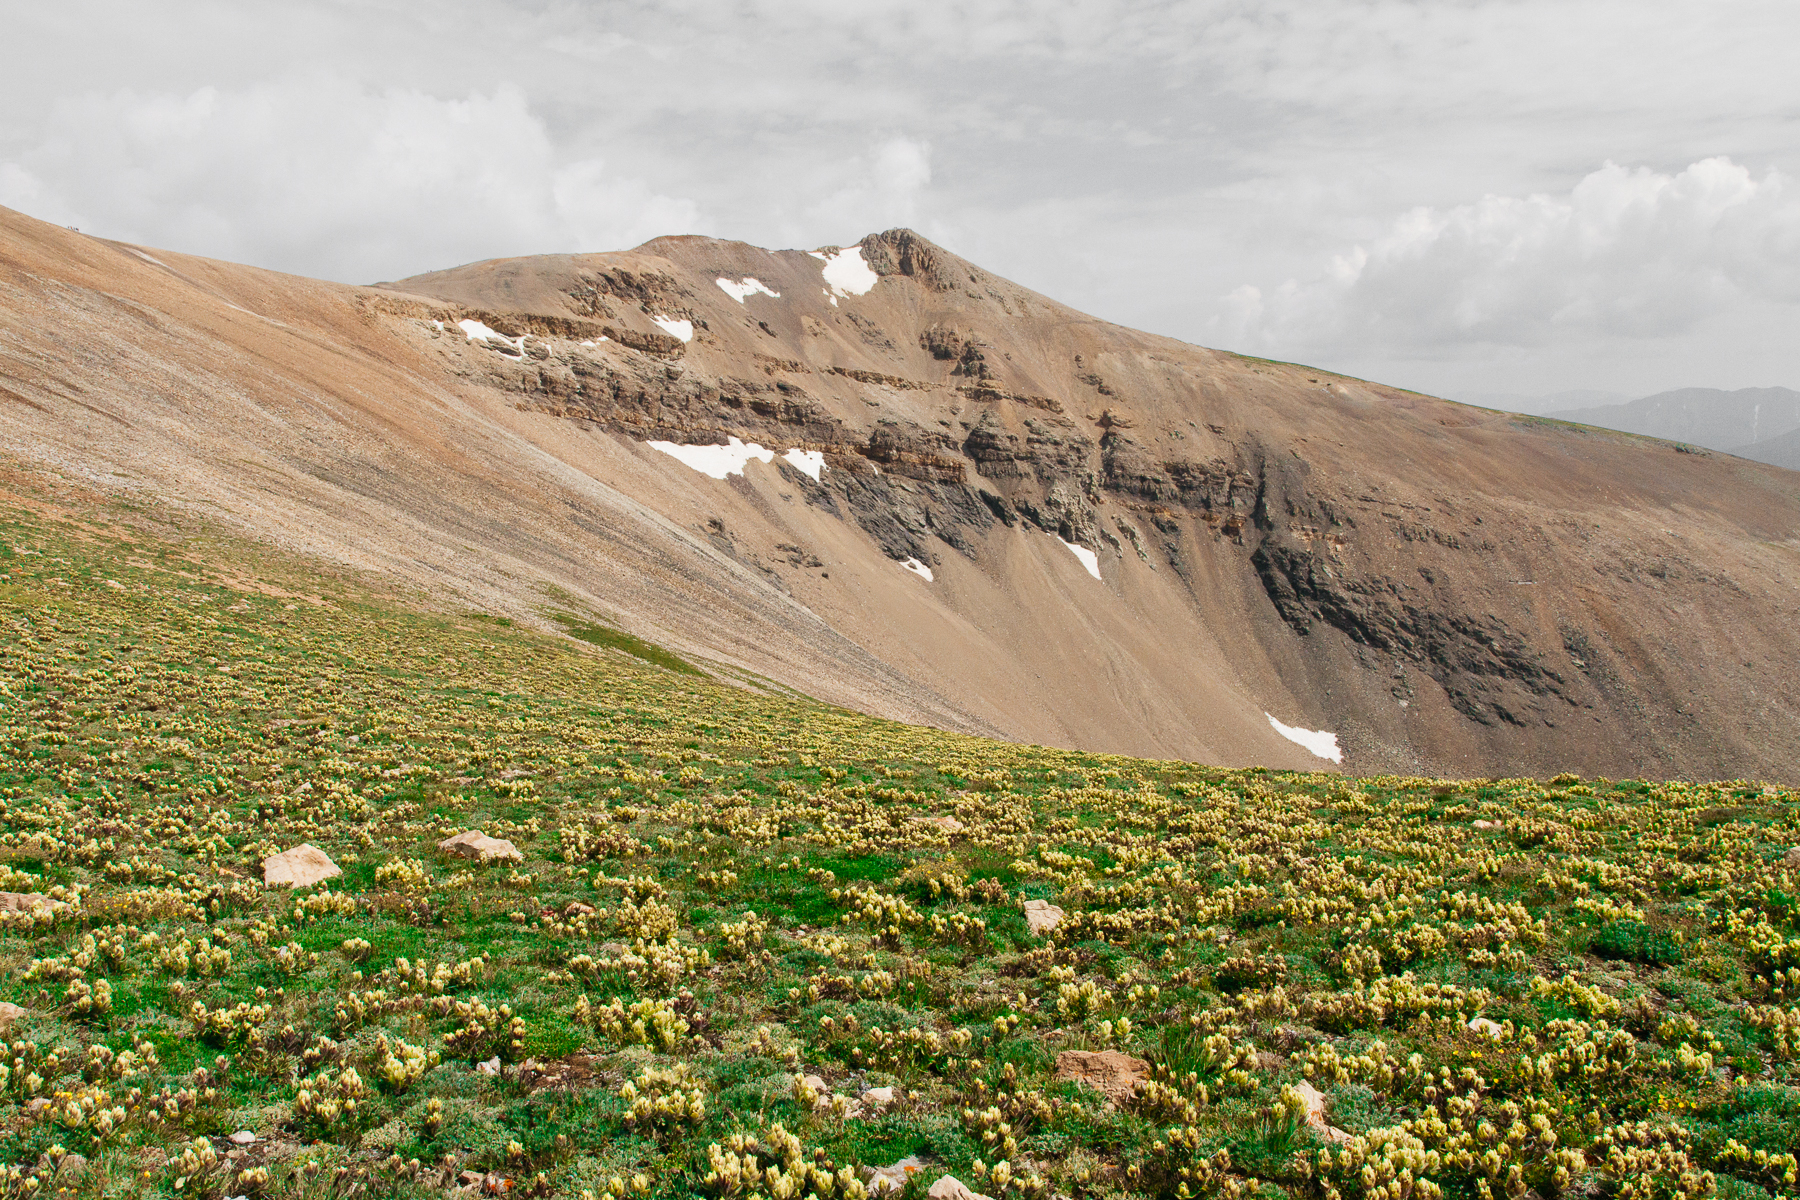 Colorado_14ers__Canon_July17_53.jpg